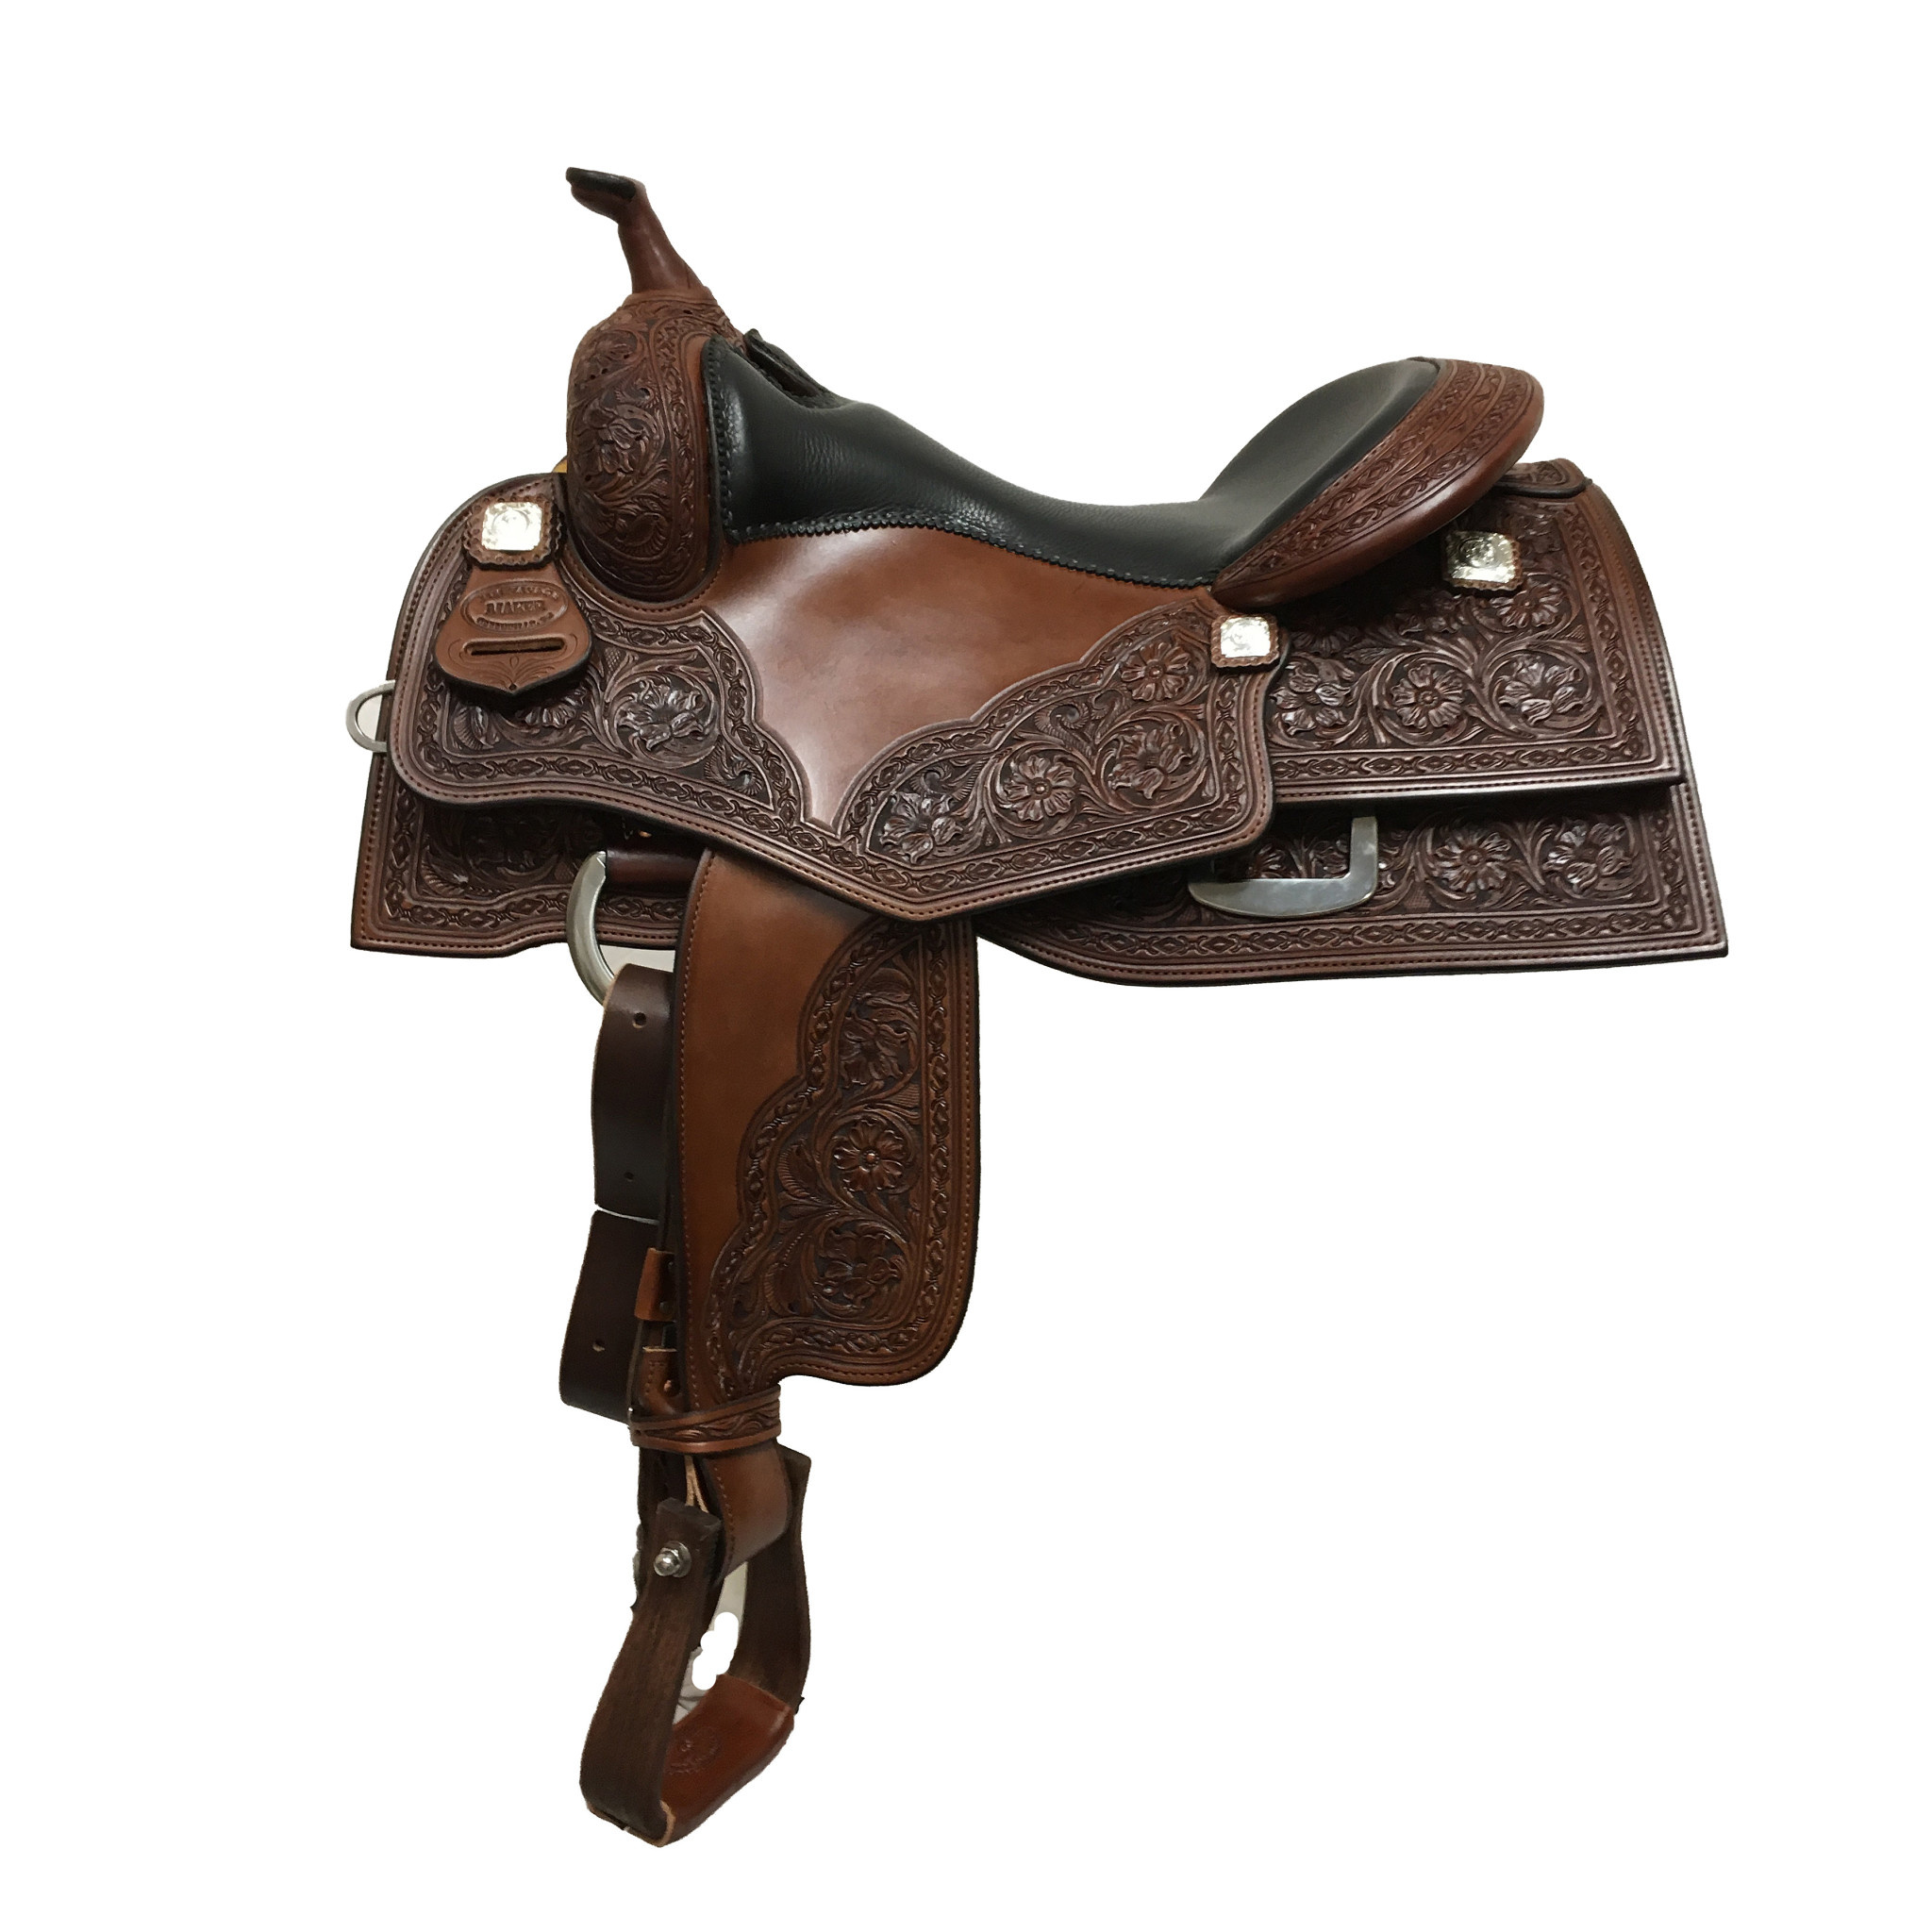 Jim Taylor Custom saddle Jim Taylor Saddle JT04kw